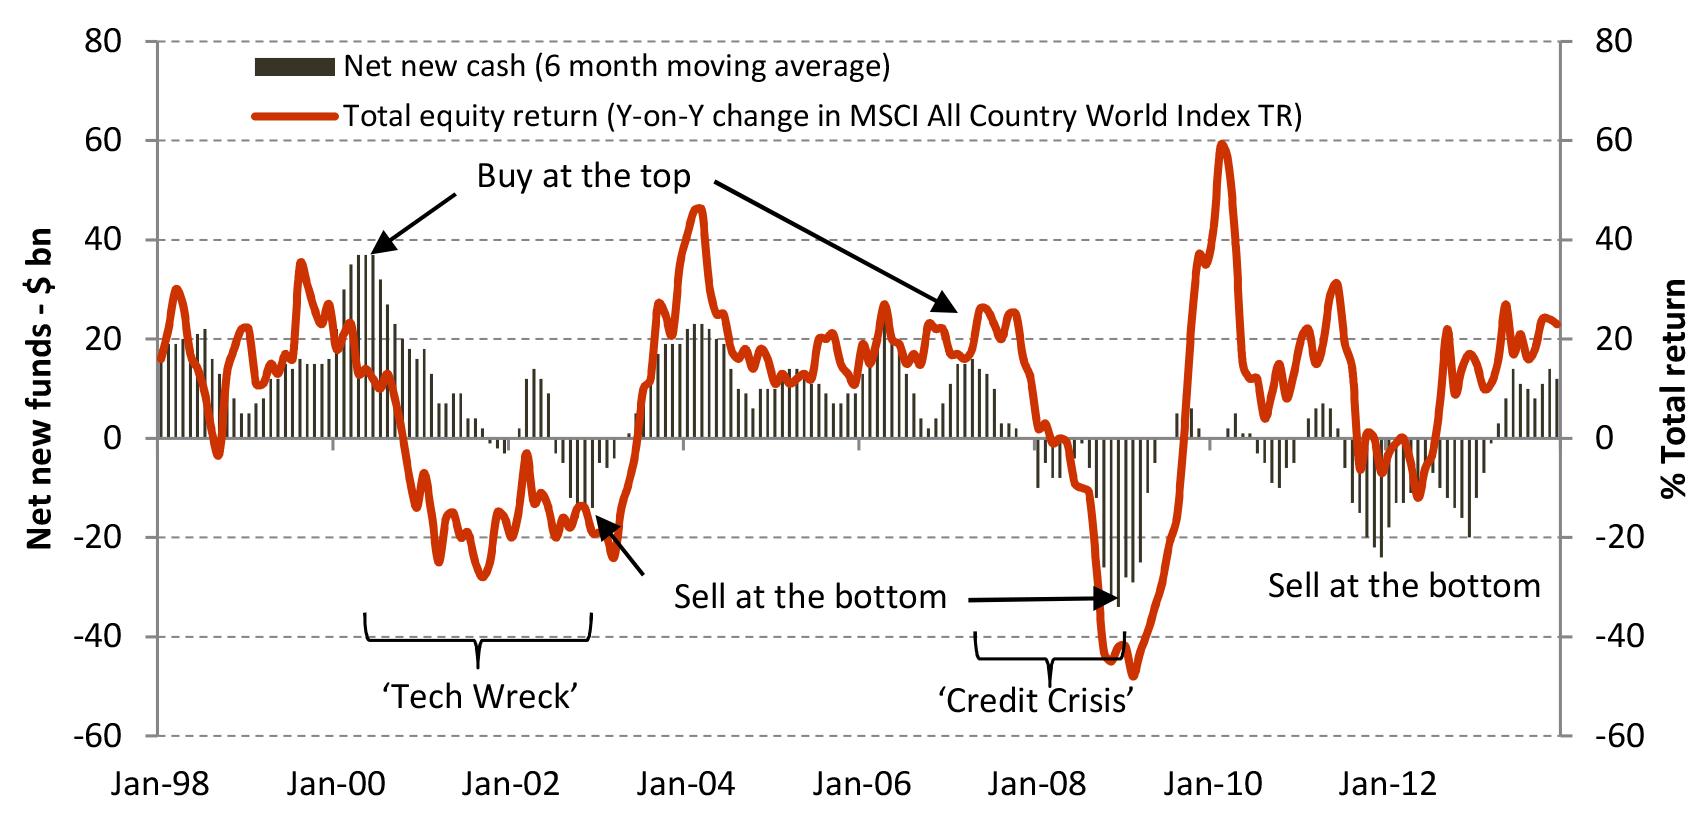 US investors - net new cash flows vs. equity market returns (1998 to 2013)